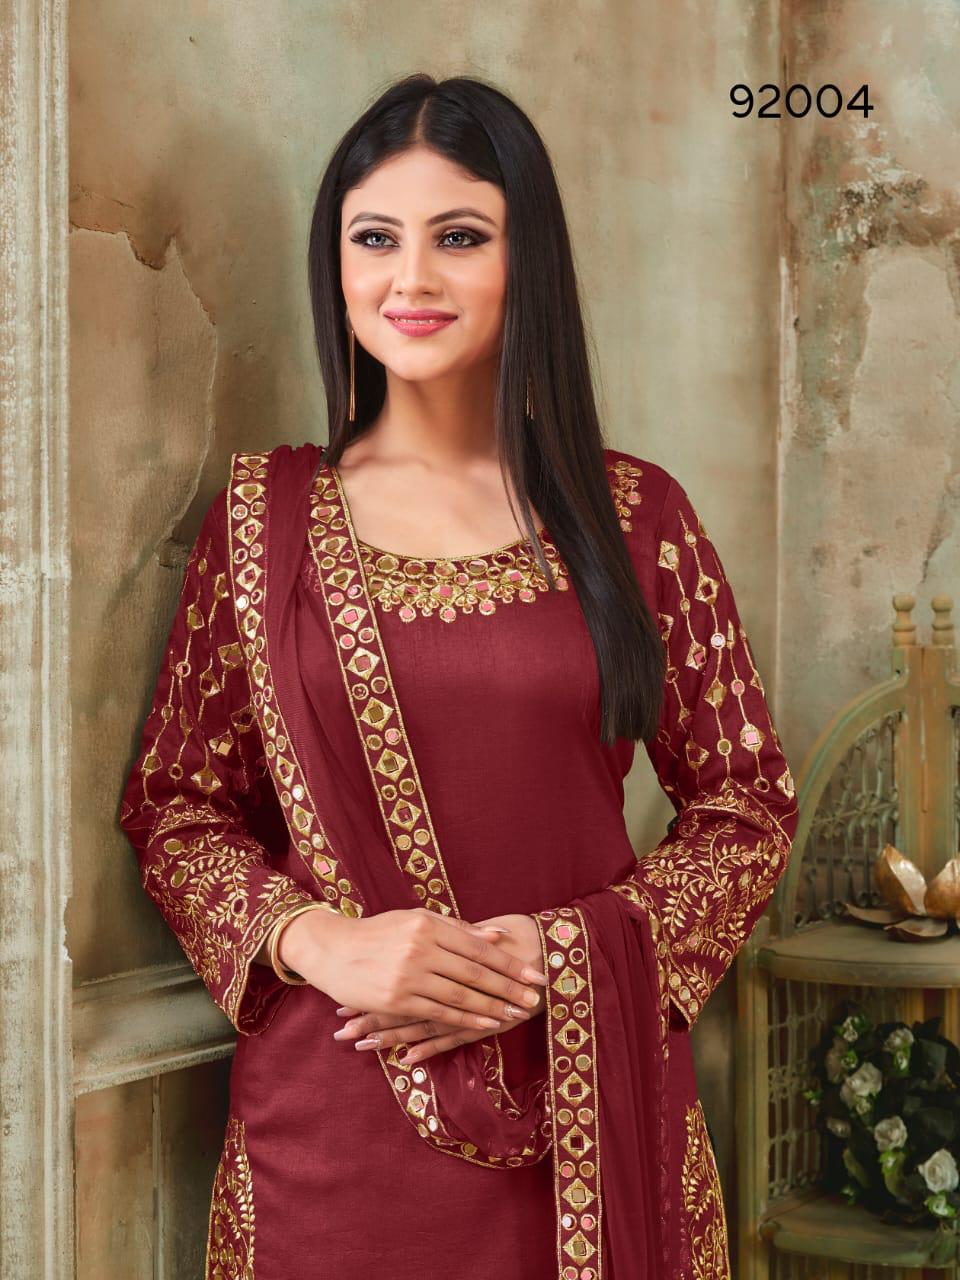 Twisha Present Aanaya Vol 92 Silk Party Wear Classy Look Suit Outfit